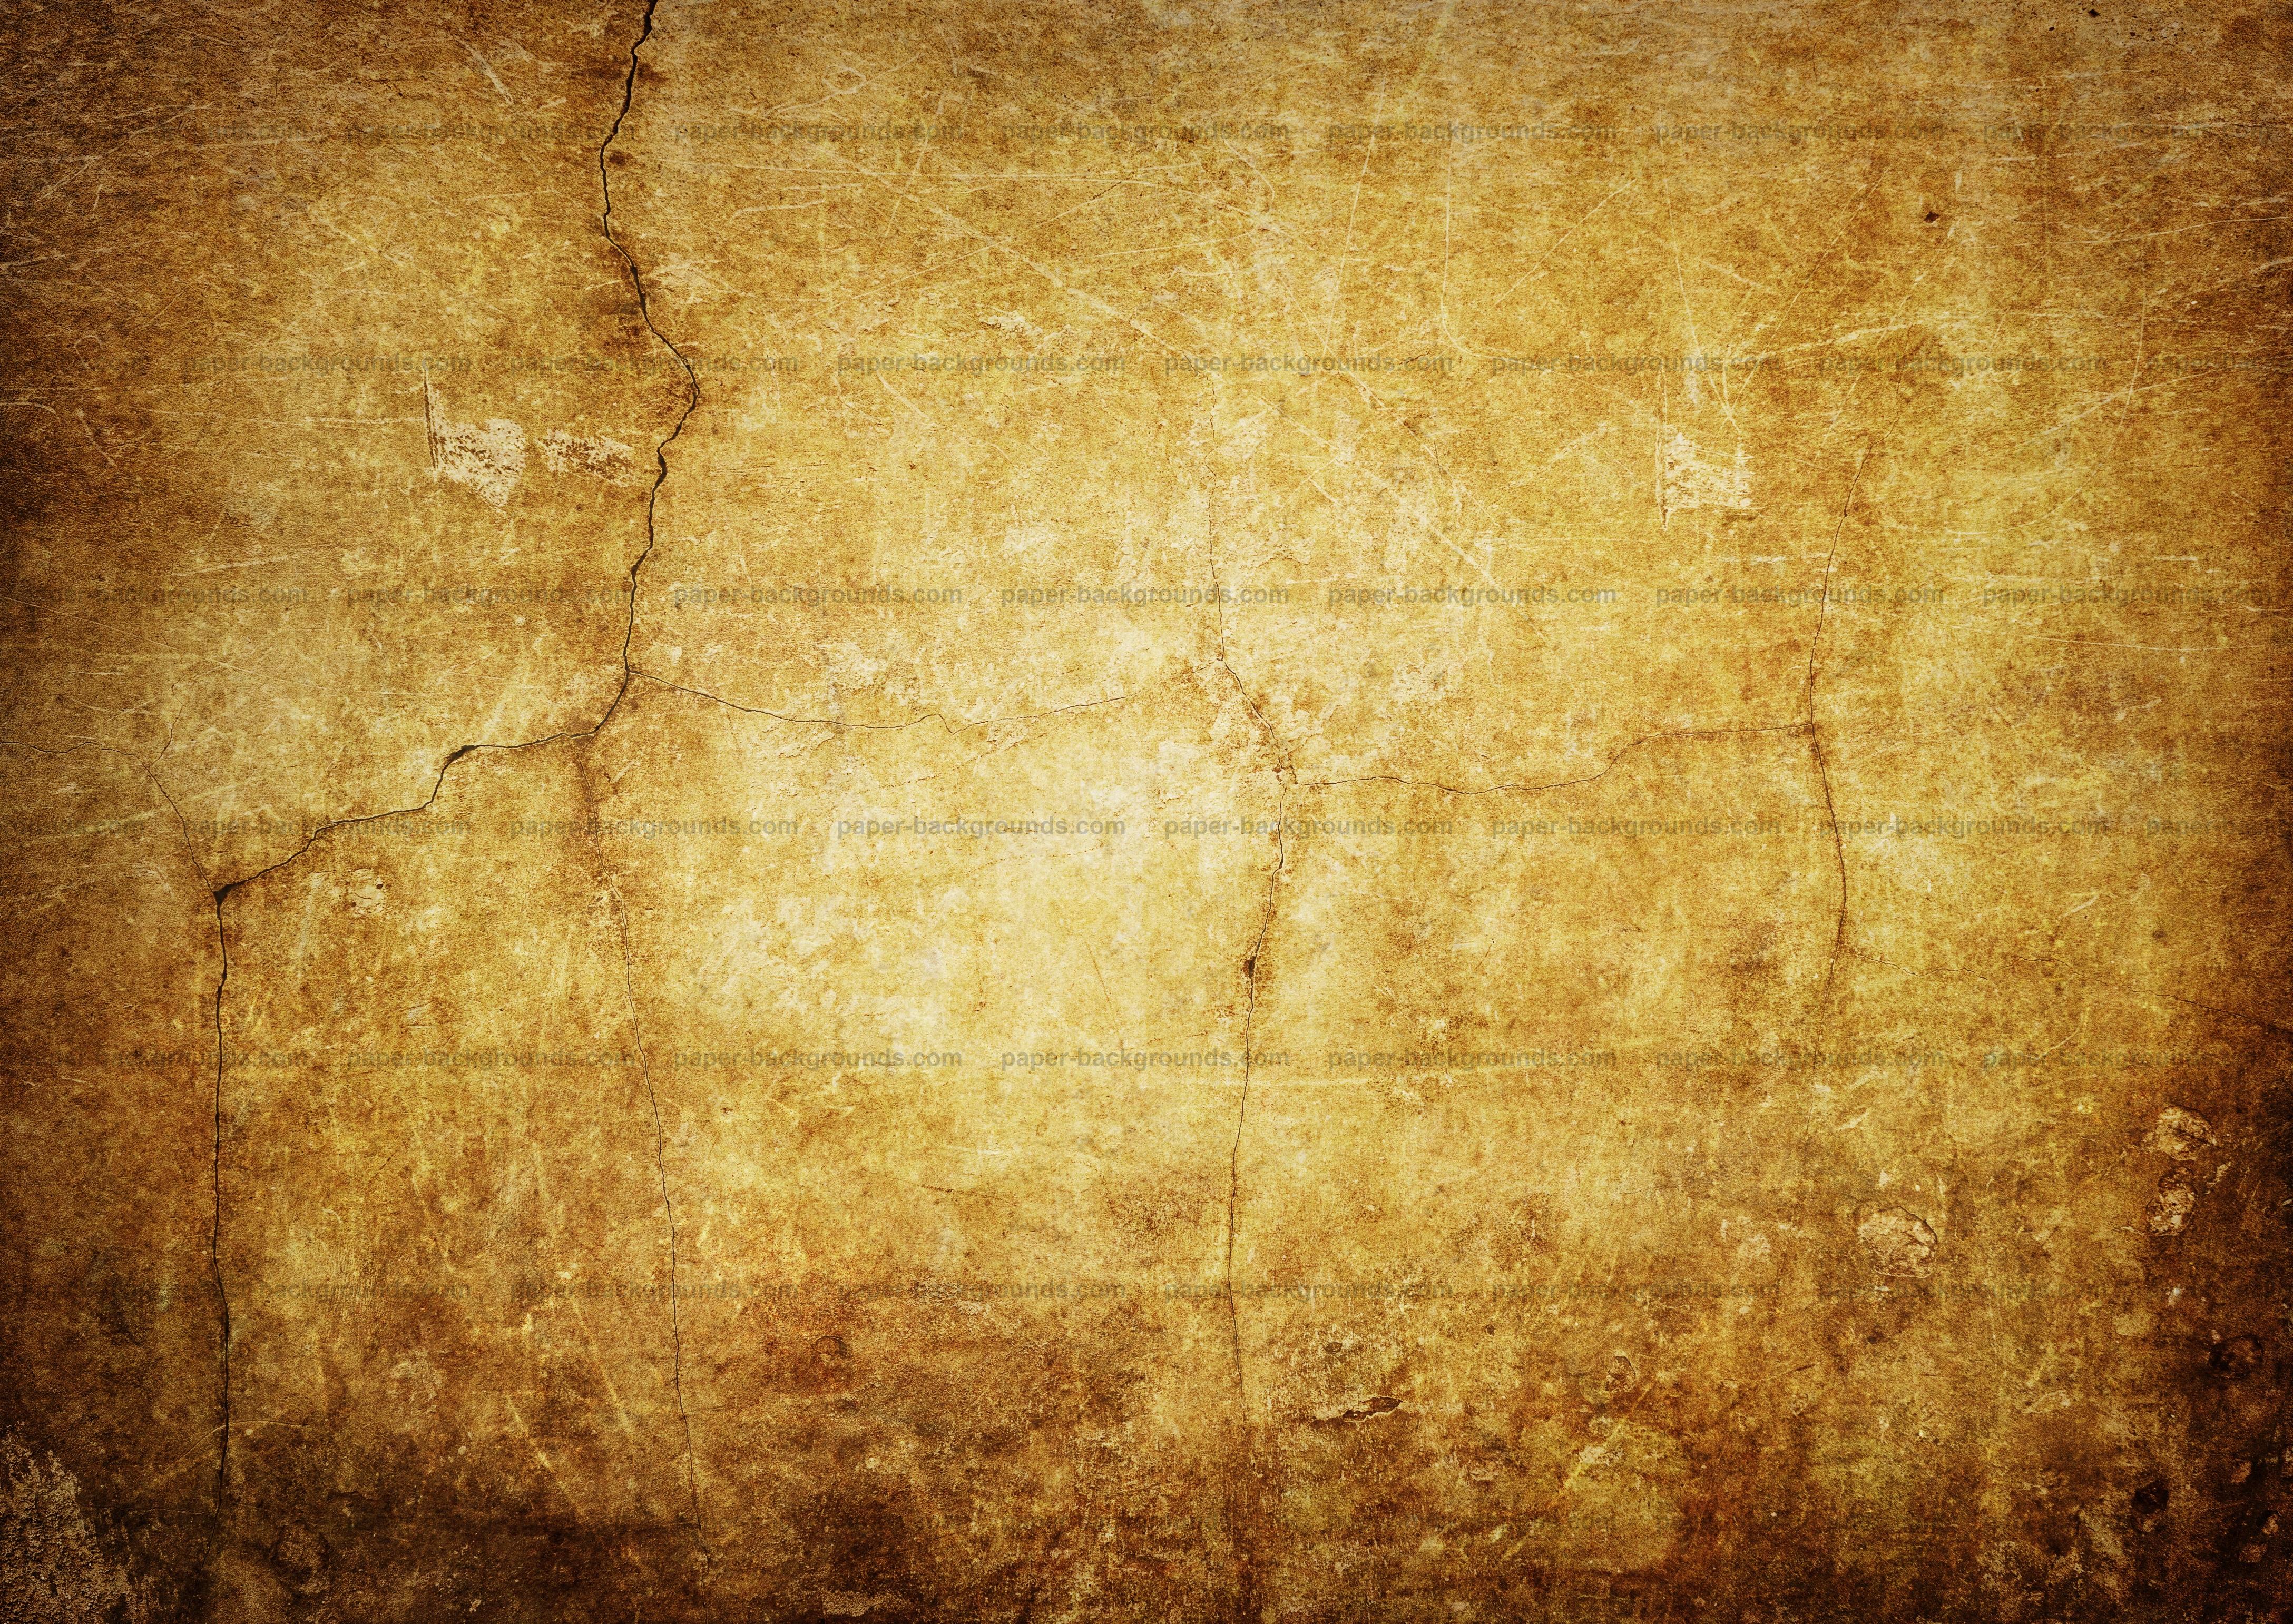 Vintage Wall Texture Background High Resoltuion 4352 x 3083 pixels 4352x3083